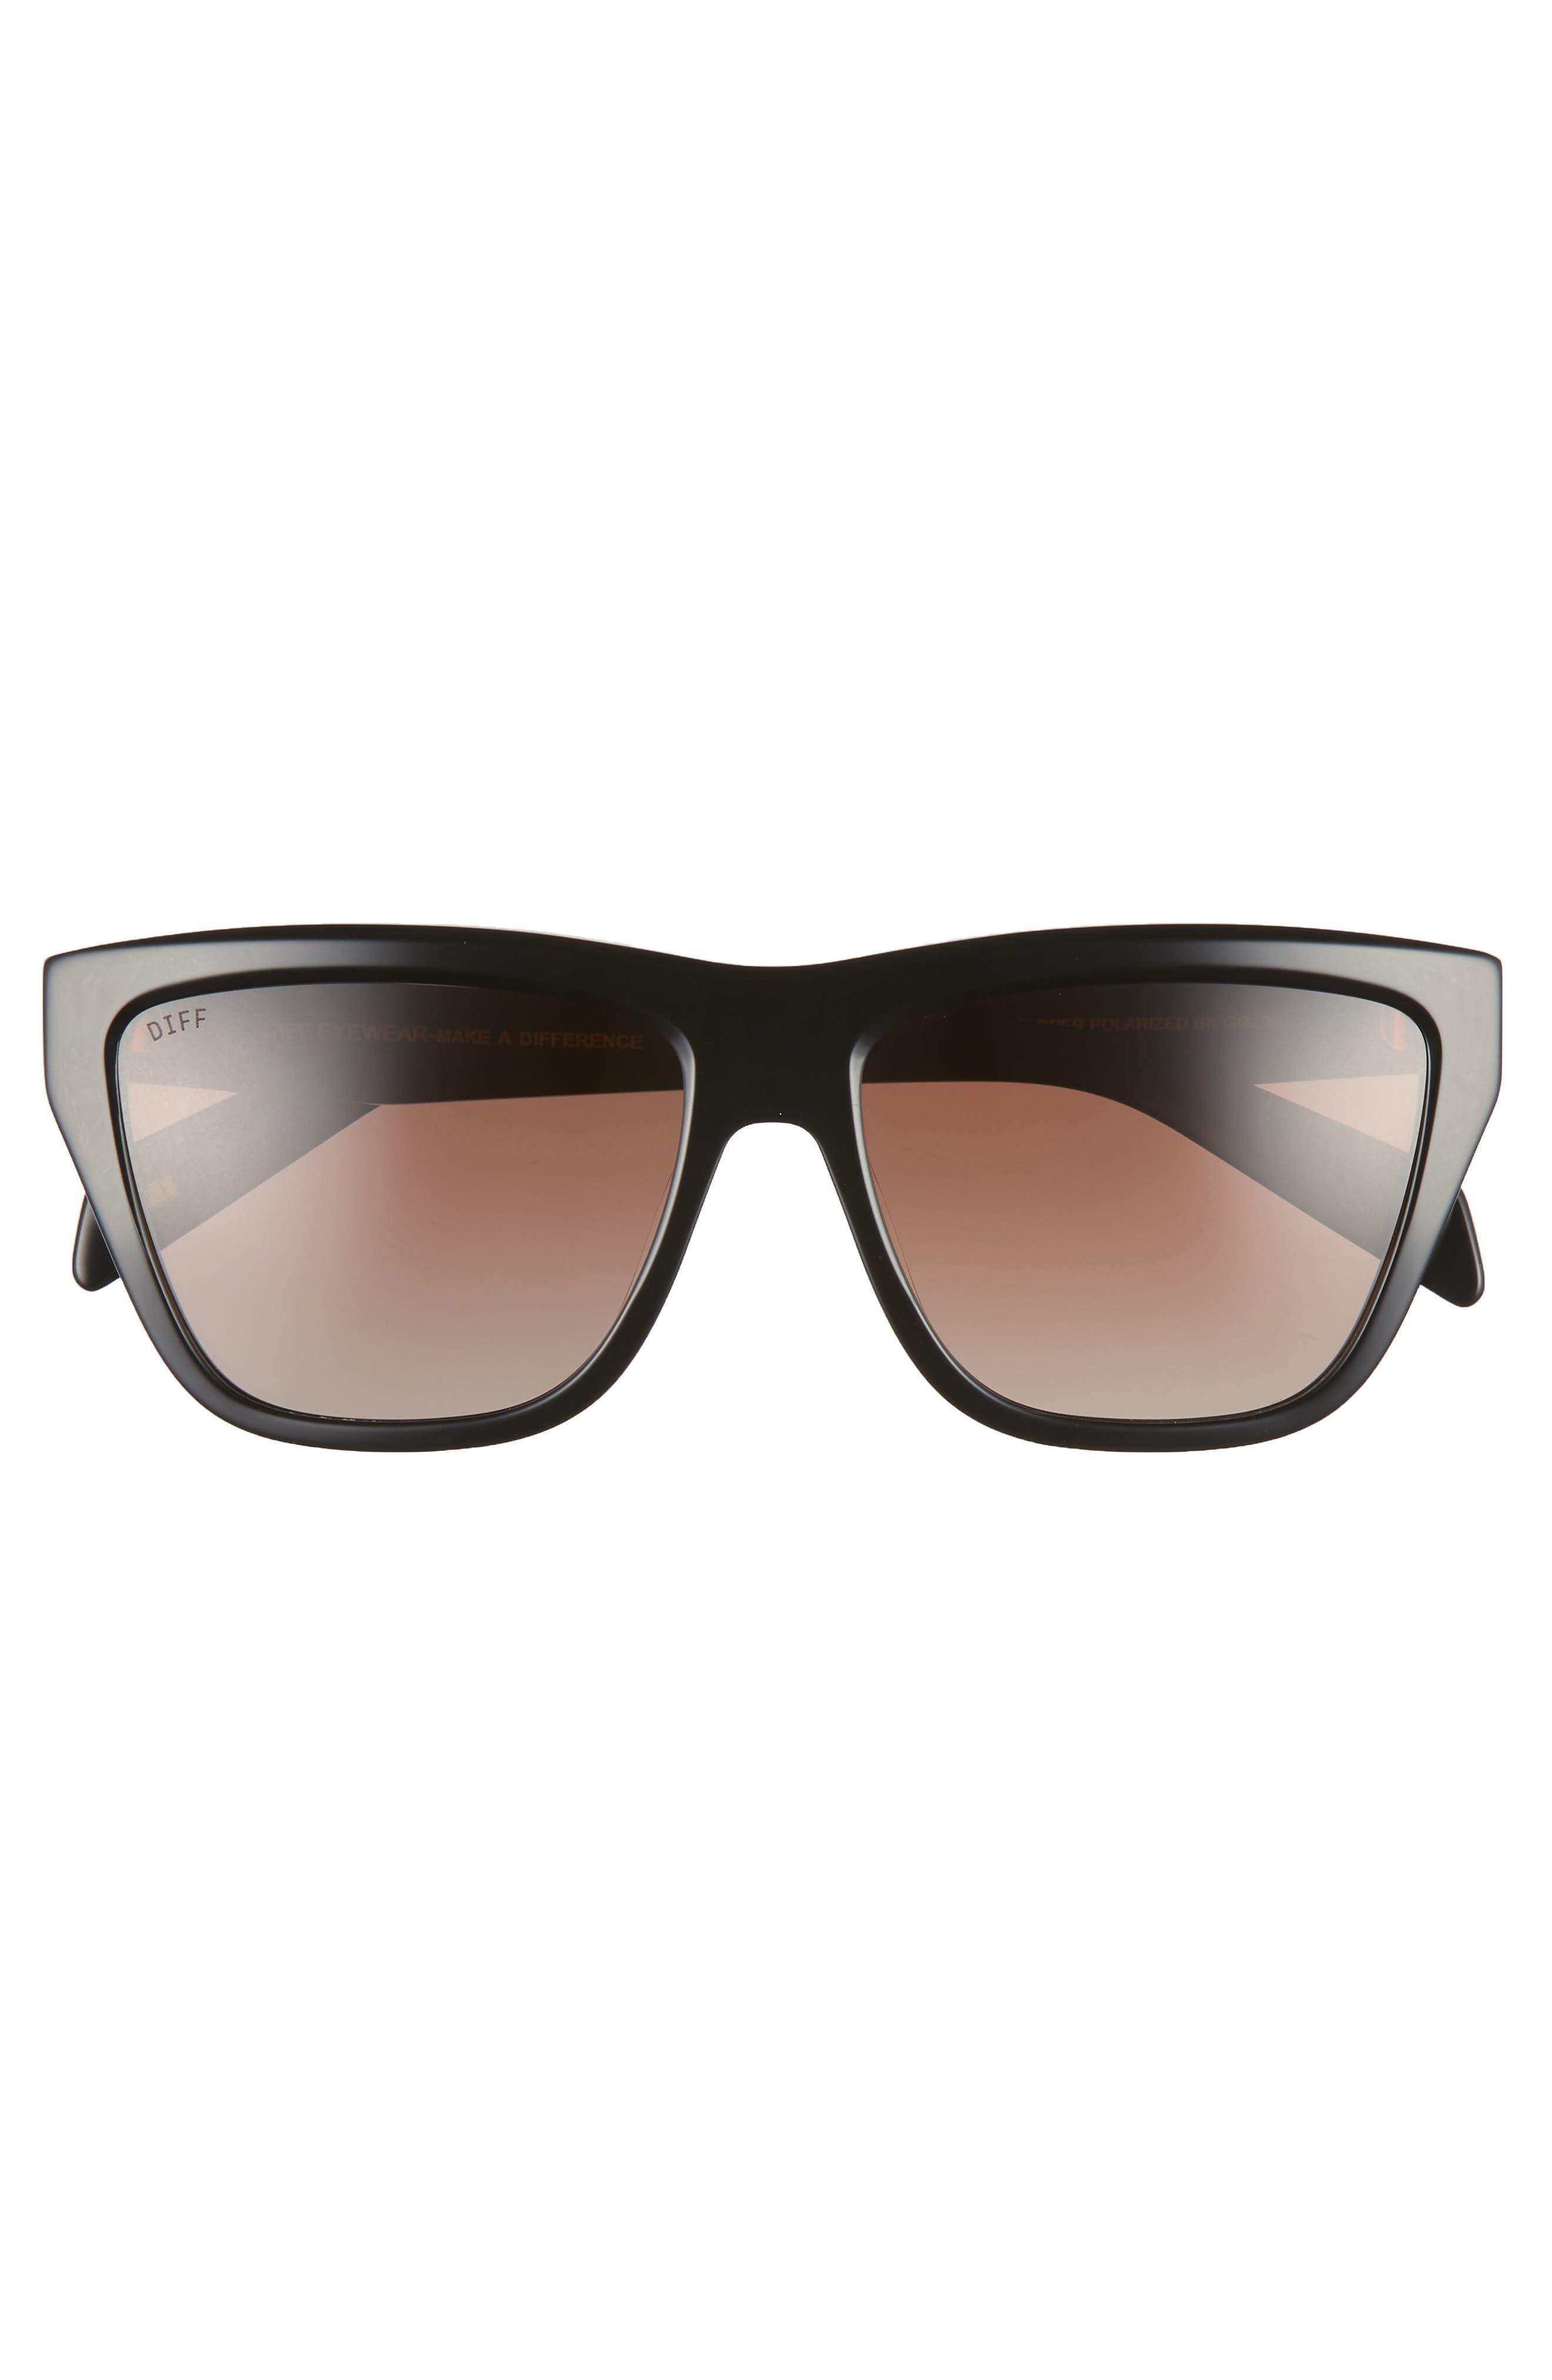 Harper 57mm Polarized Gradient Sunglasses,                             Alternate thumbnail 3, color,                             BLACK/ BROWN